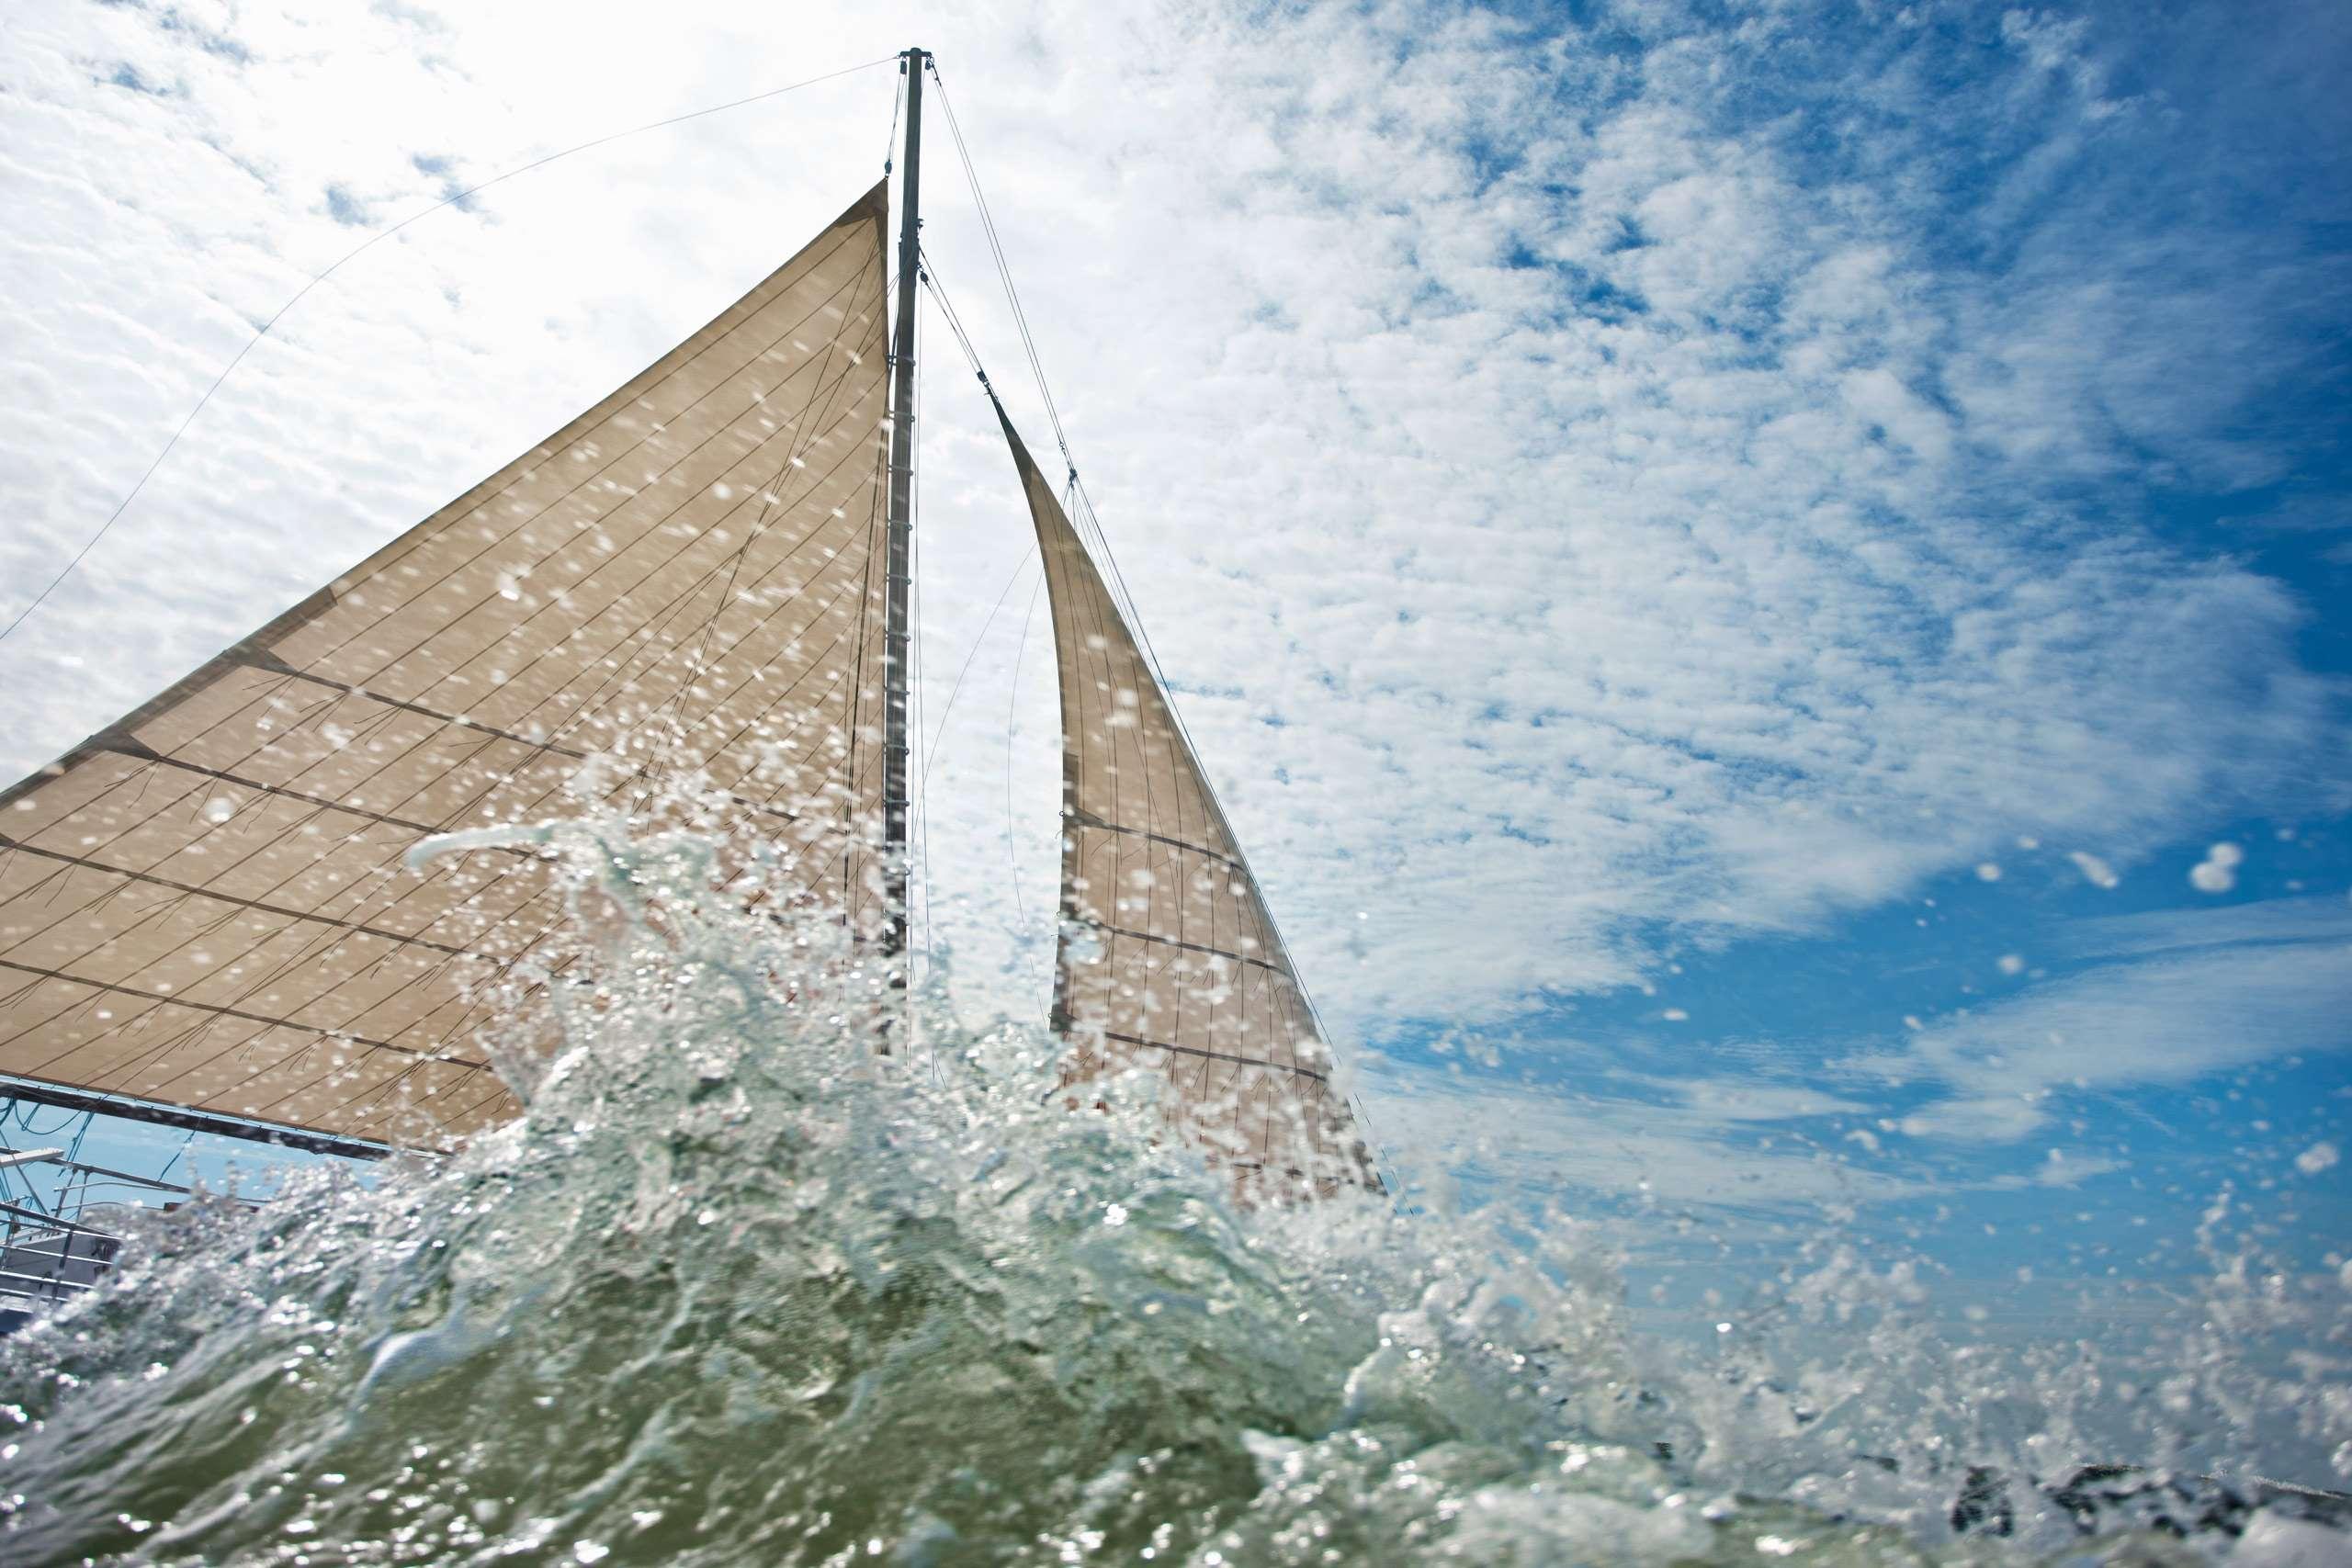 PORTFOLIO - Sailing - Skipjacks #2  PCG757